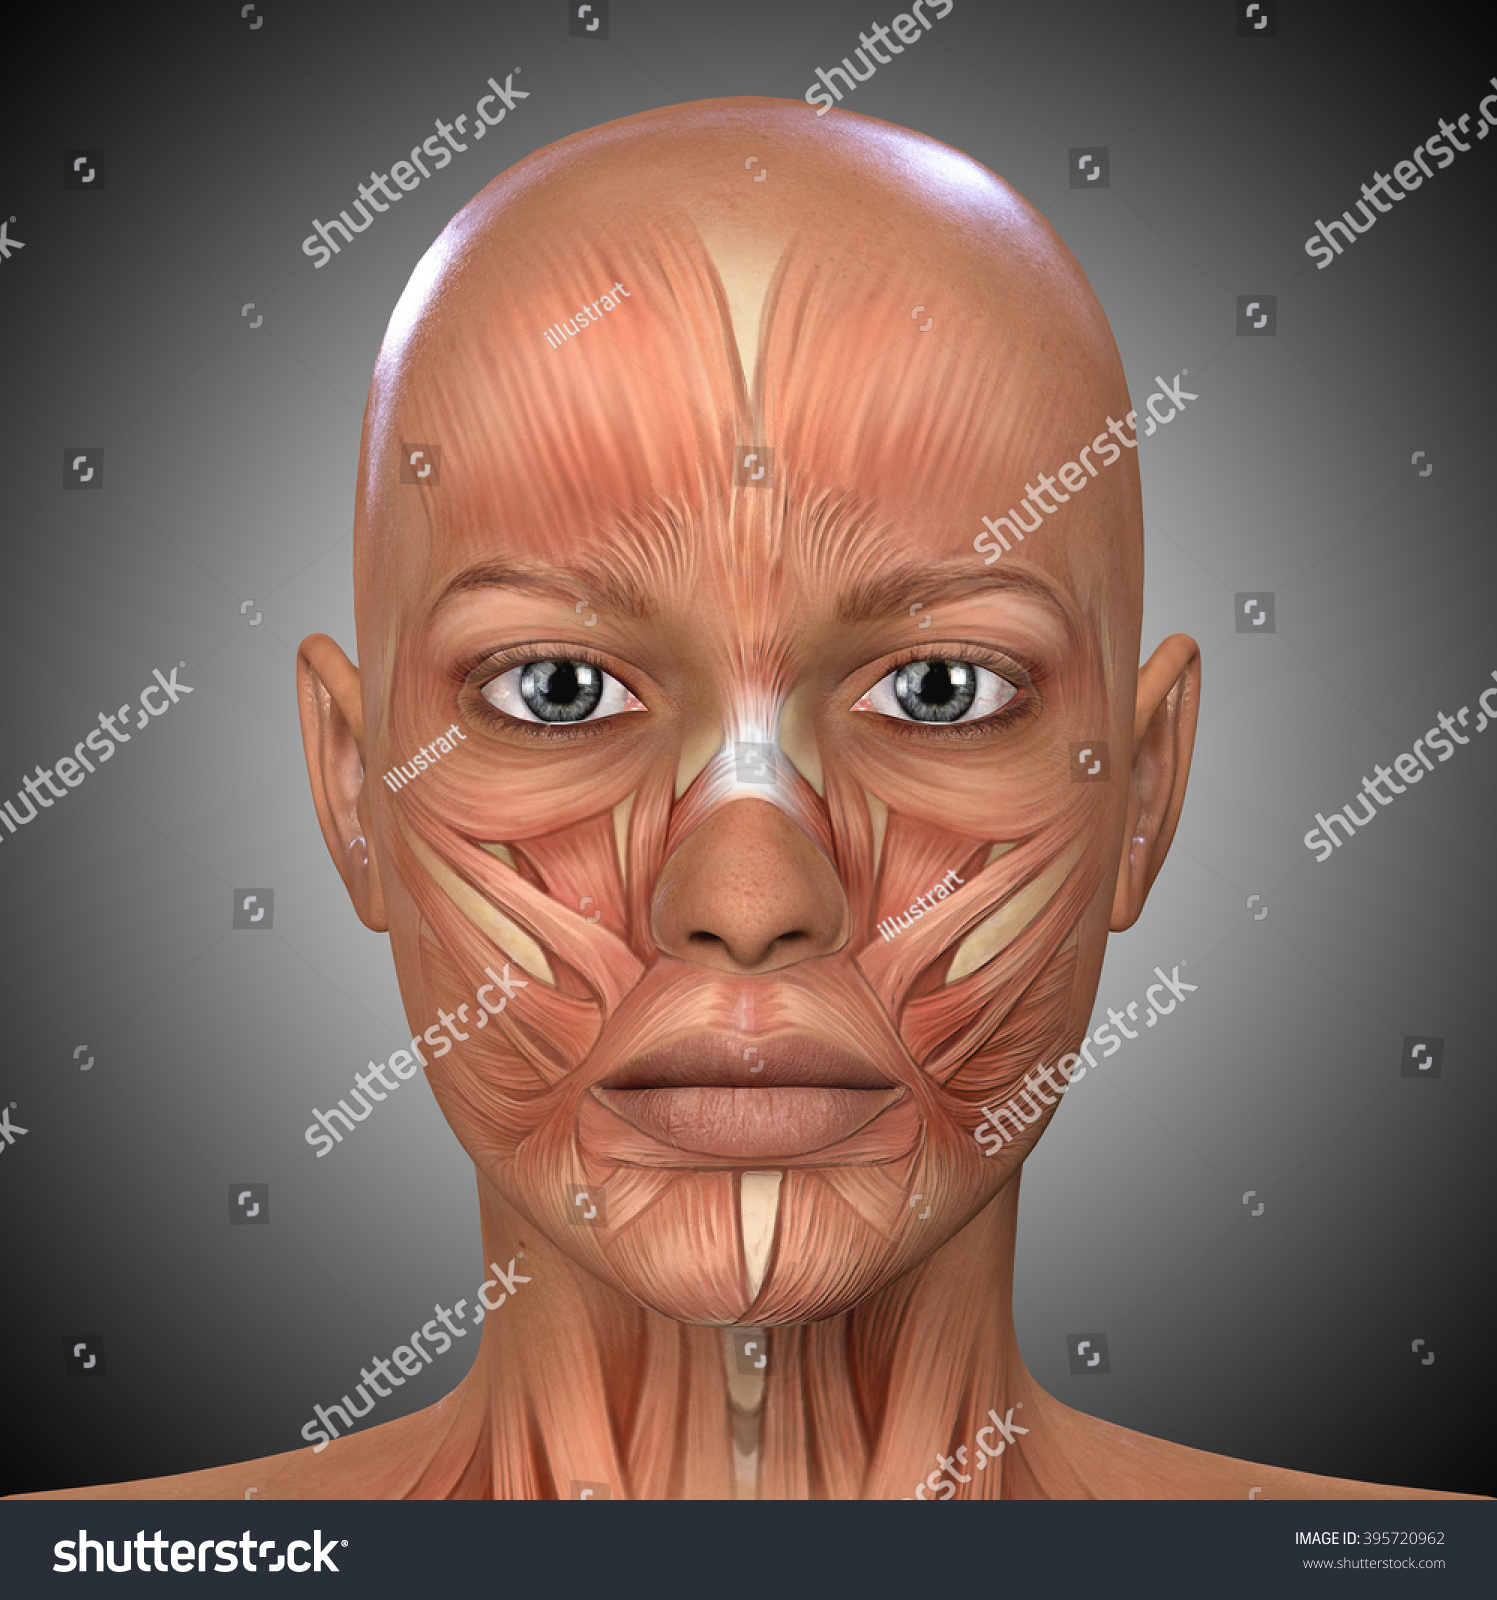 Female Face Muscles Anatomy Stock Illustration 395720962 Shutterstock